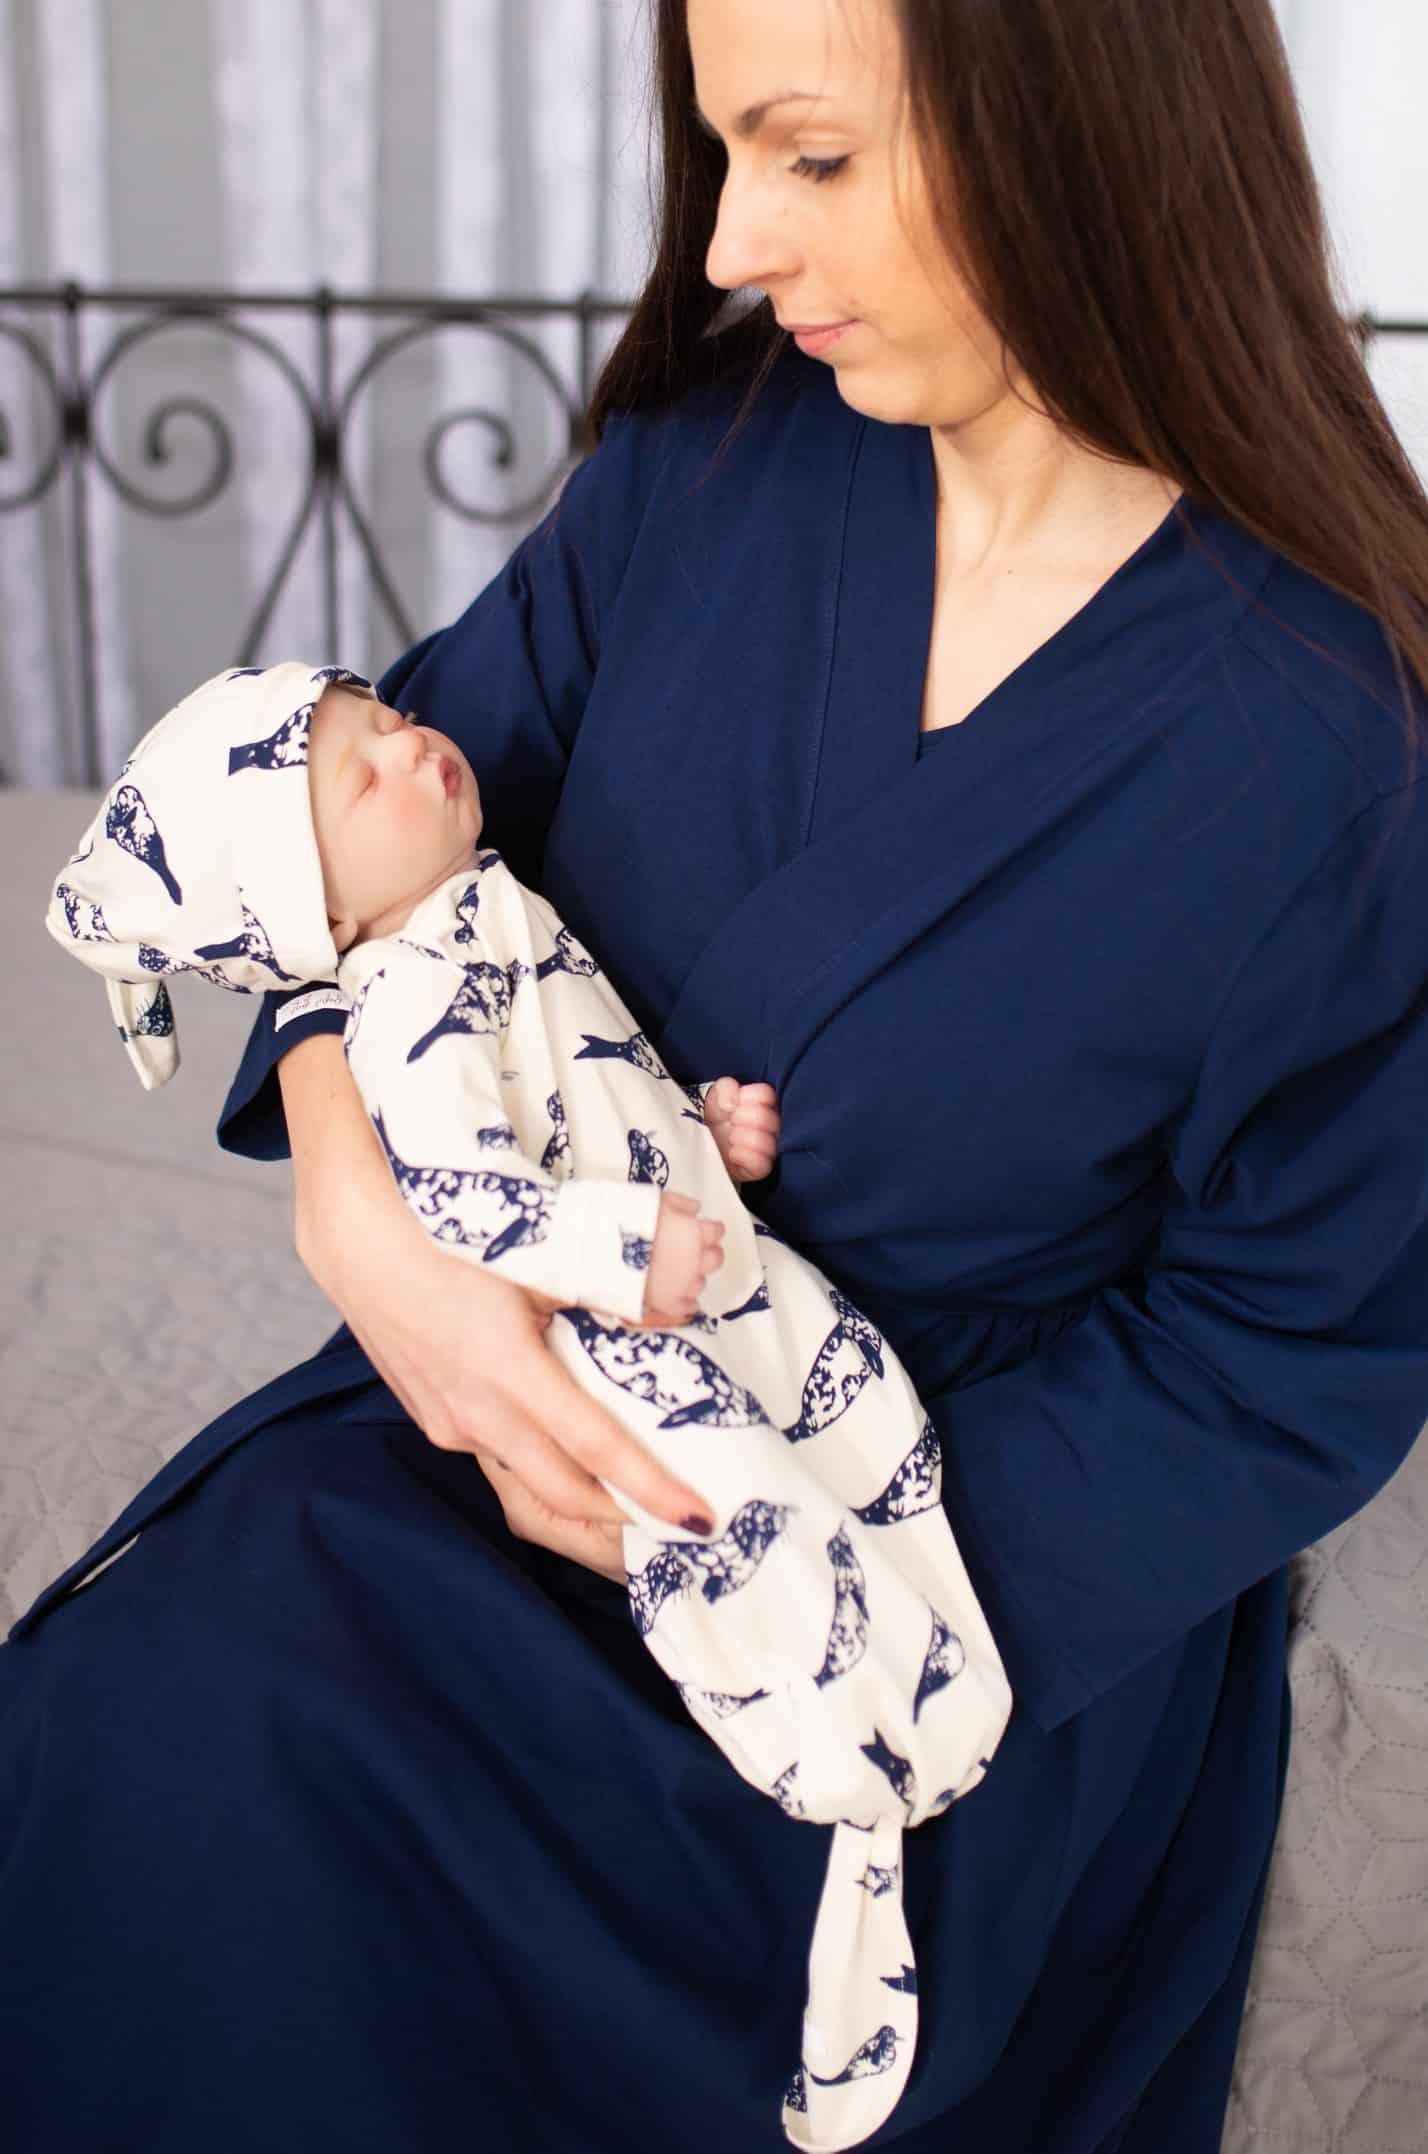 Royal Blue & Baby Seal baba-mama szett